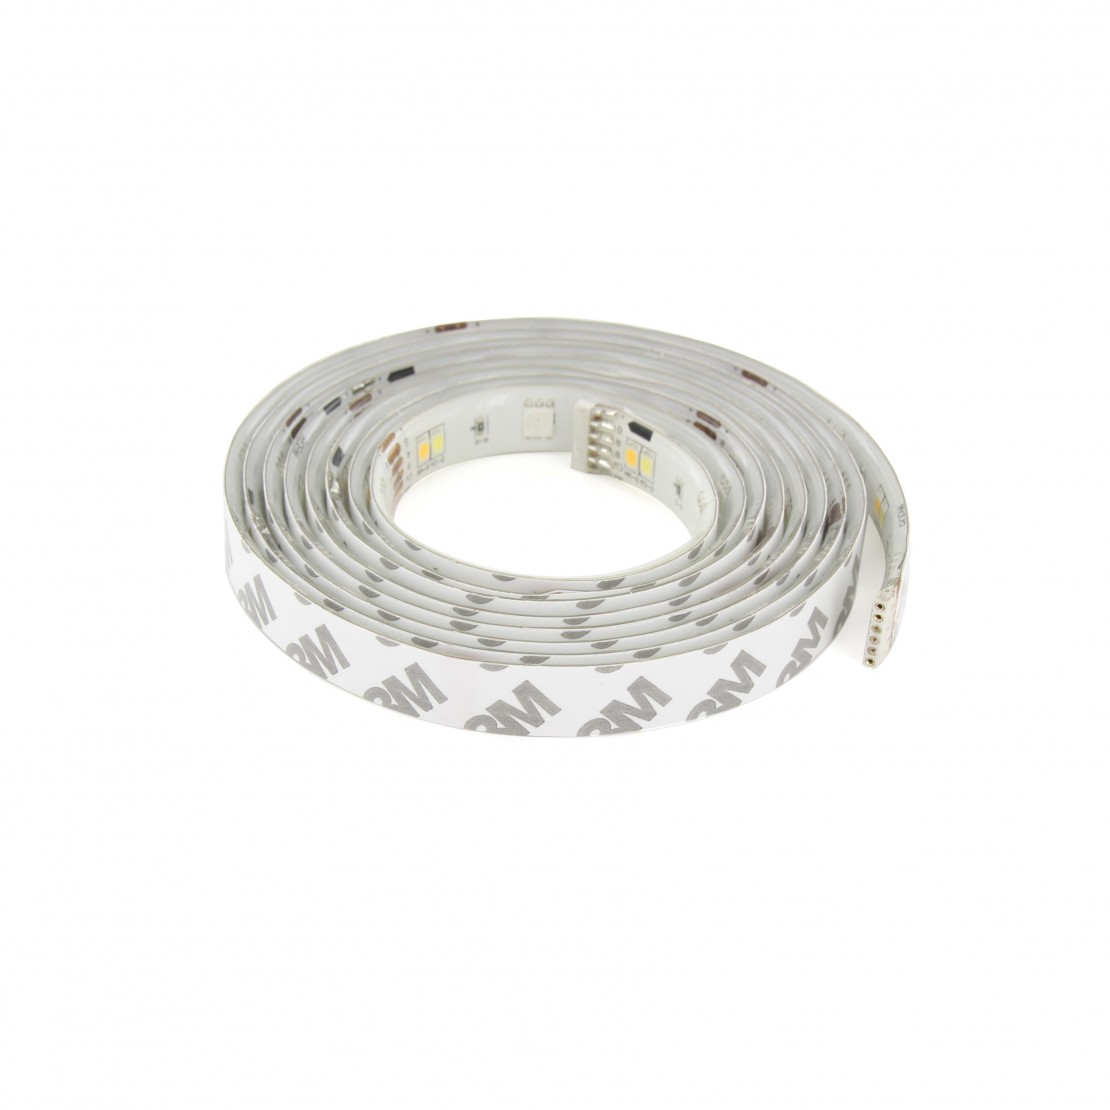 StripLED - tira luminosa LED conectada Bluetooth